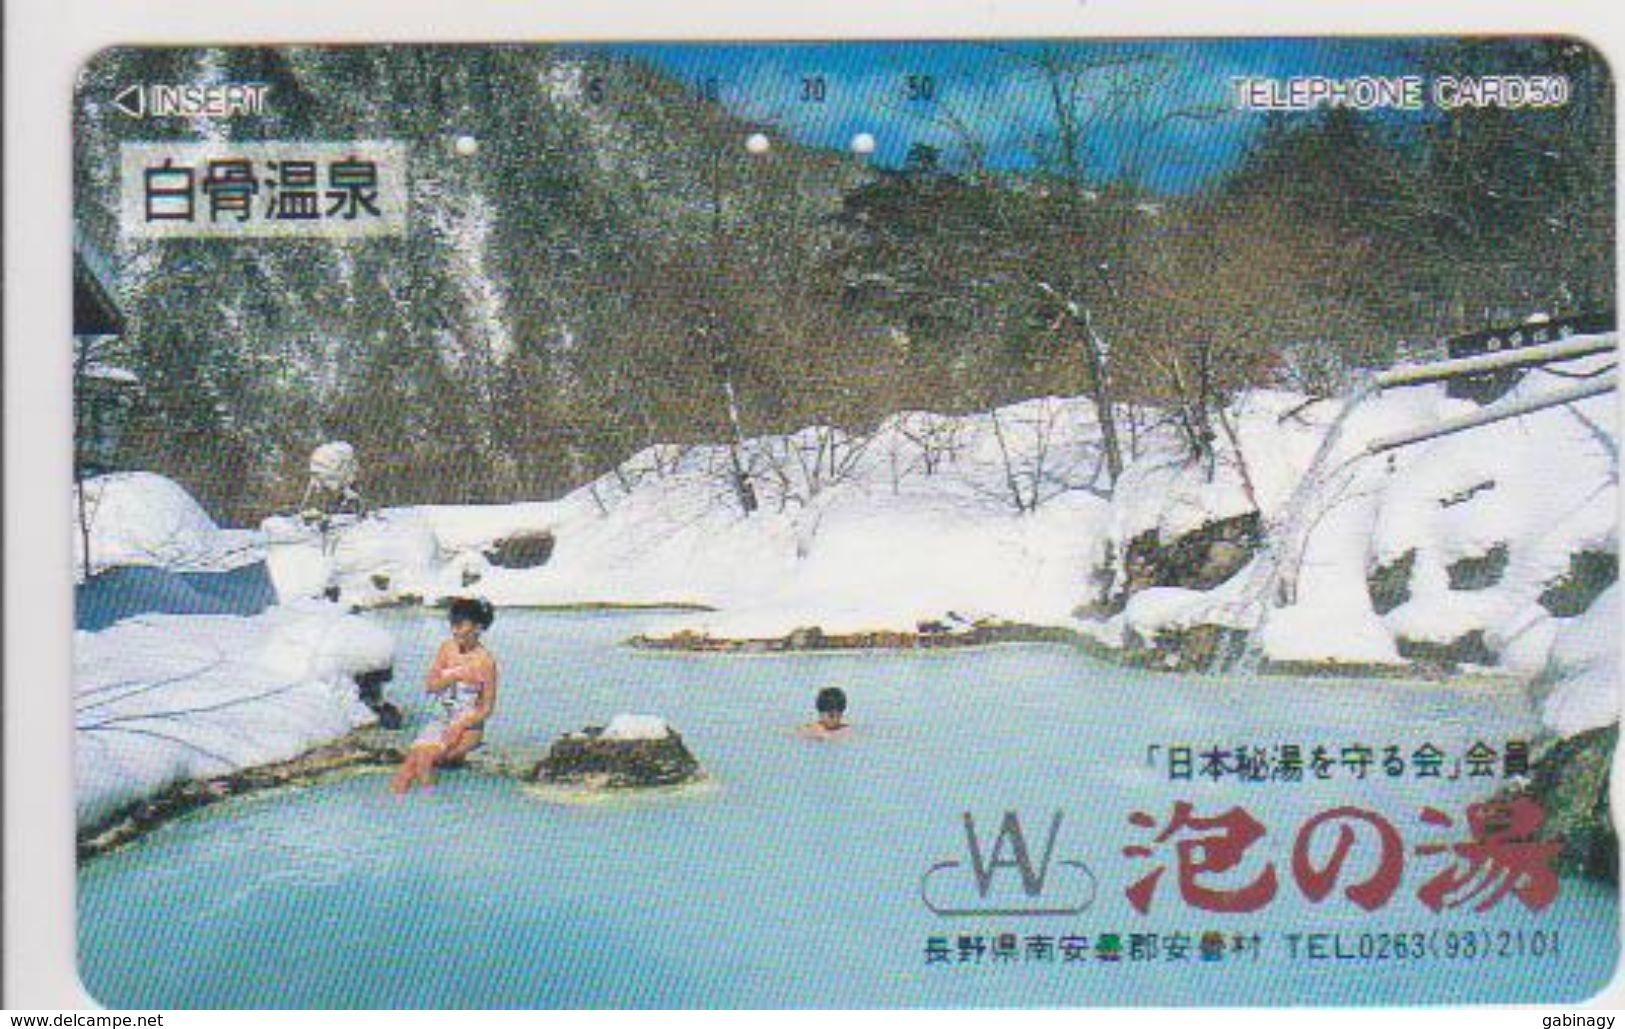 JAPAN - FREECARDS-0722 - 110-26612 - WOMAN - Japon